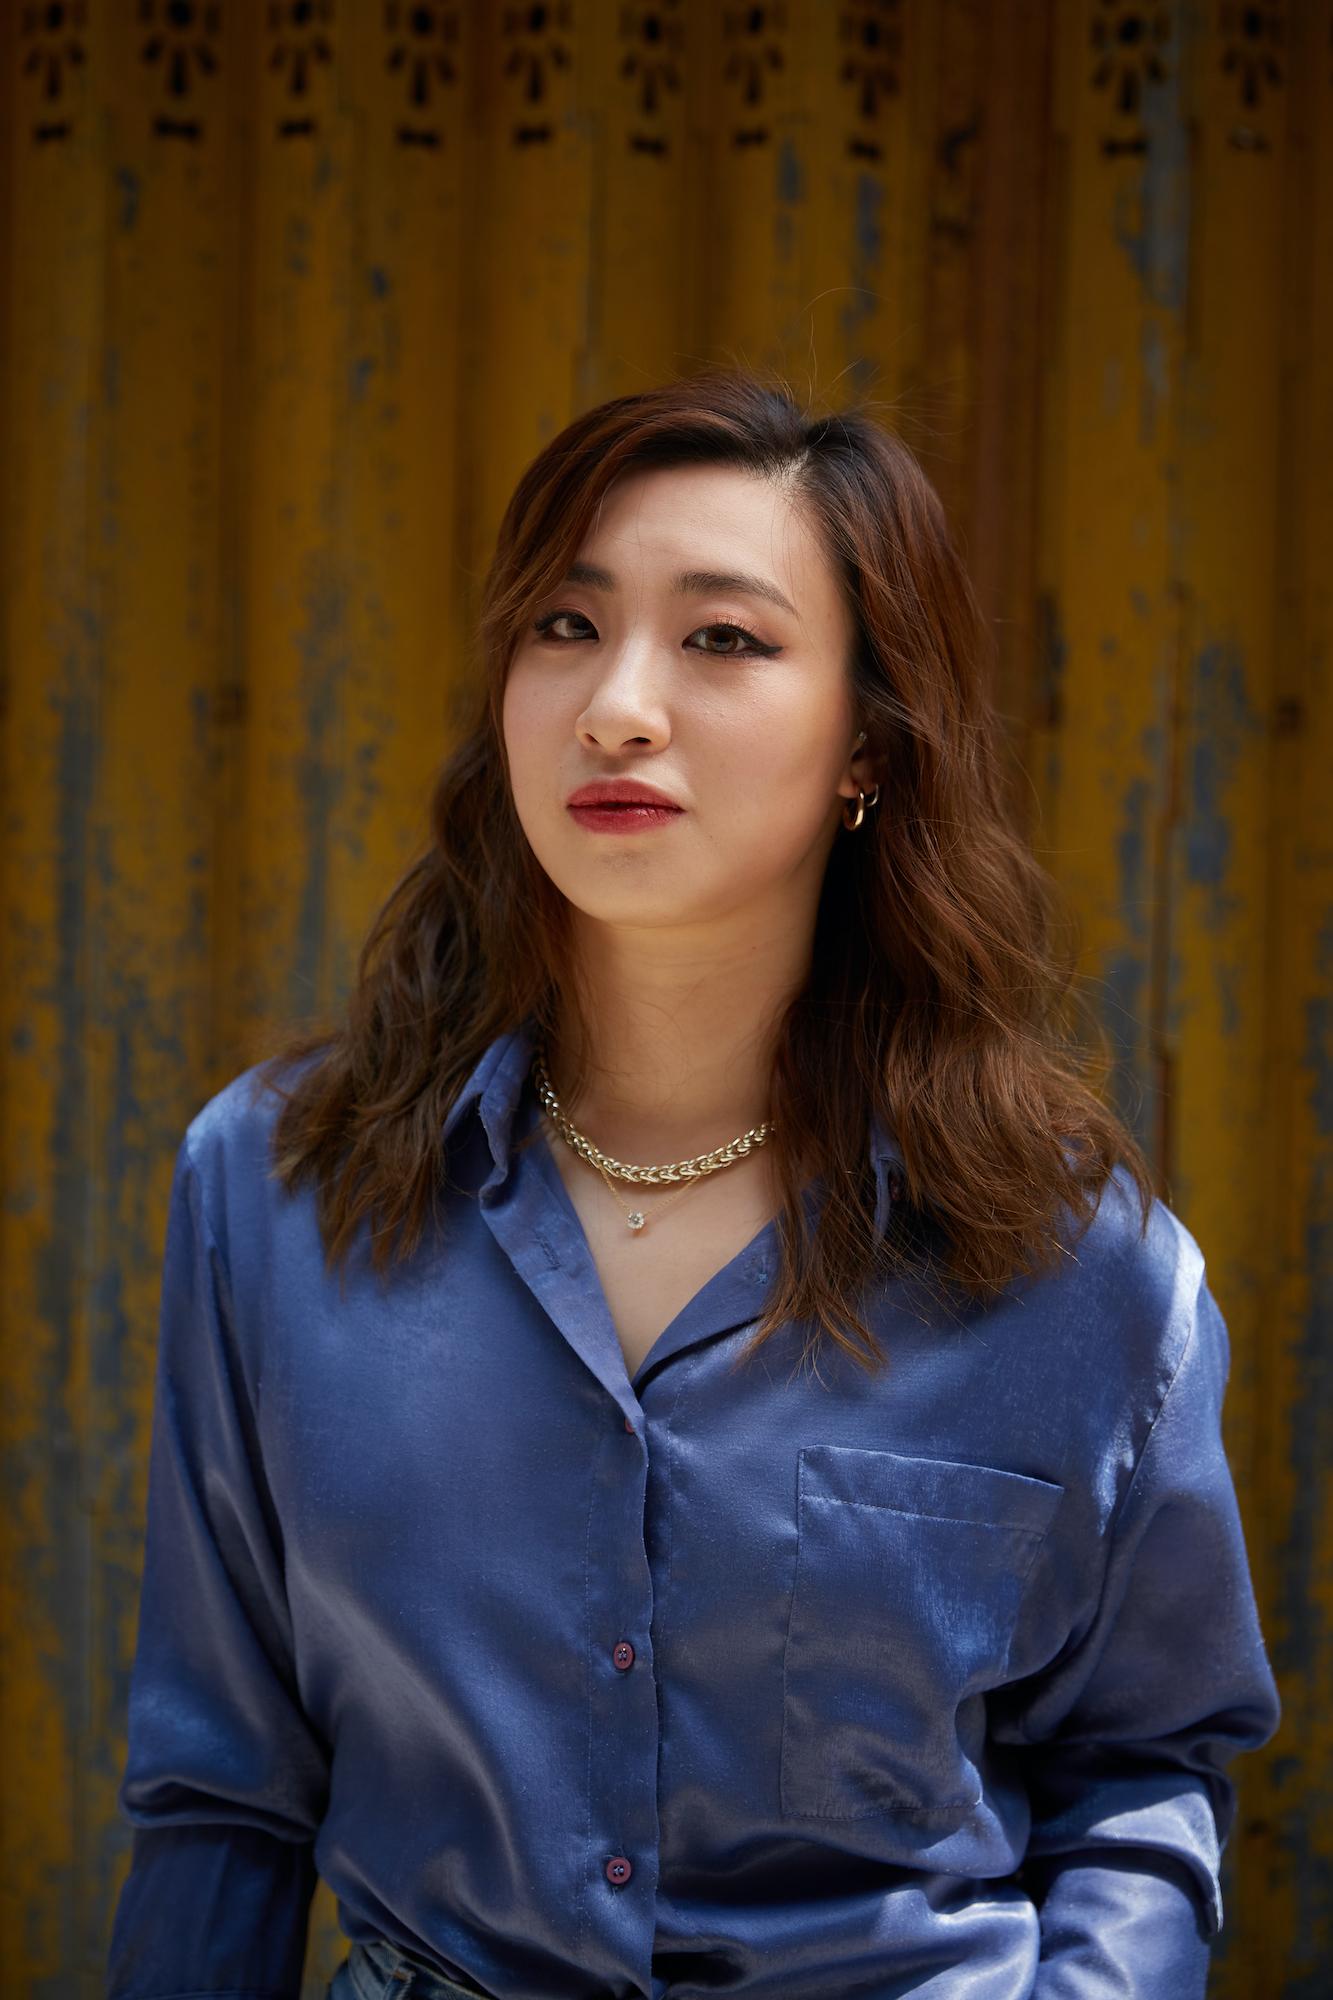 Vivian Lu, stage designer, owner of Vivian Lu Design Limited and co-owner of We Create International